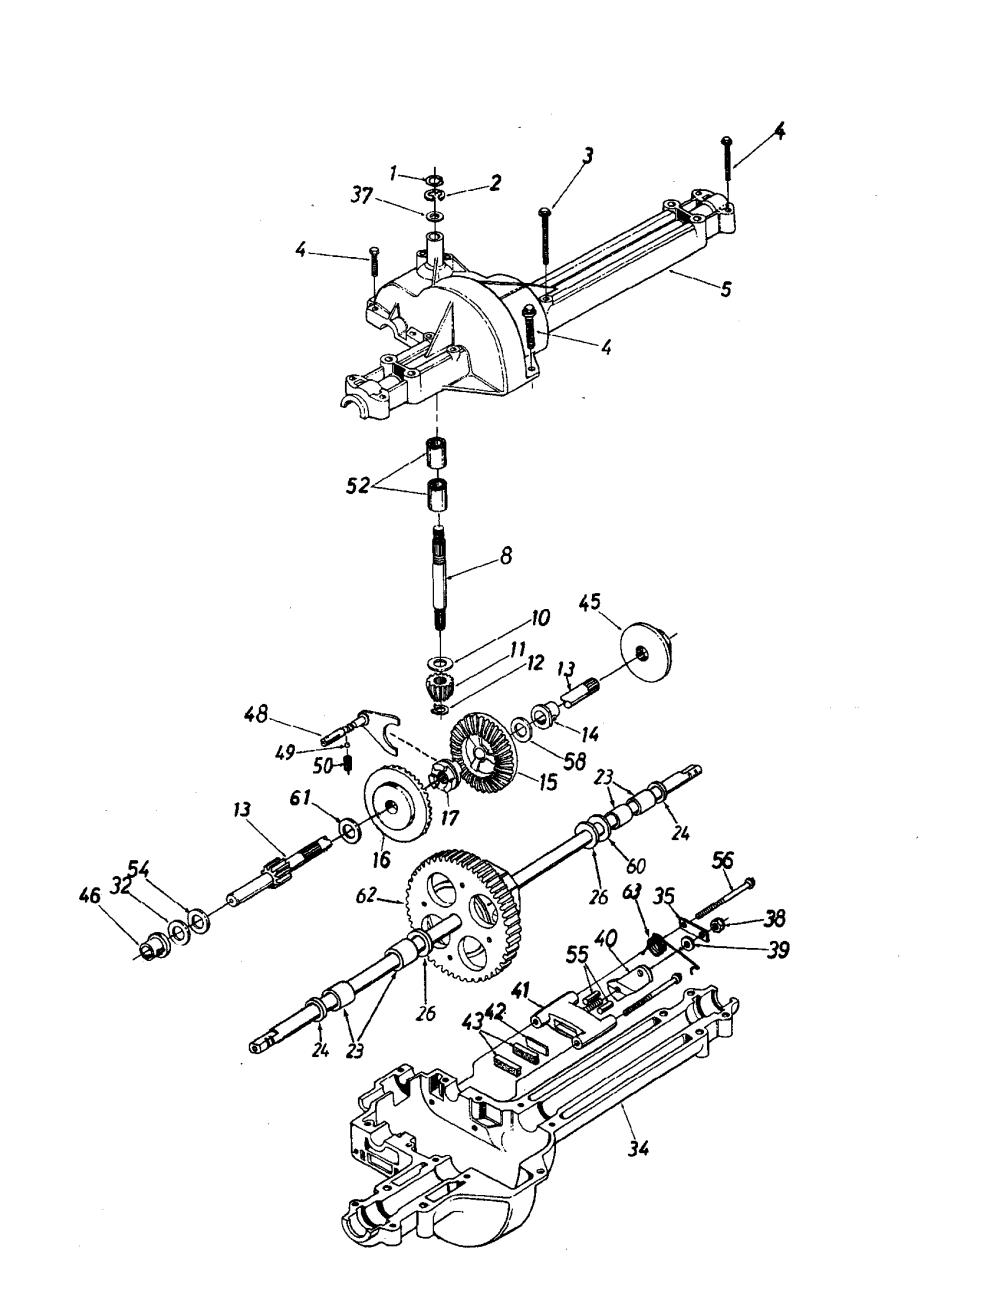 medium resolution of yard machine mower wiring diagram yard discover your wiring mtd lawn tractor transmission belt diagram electric